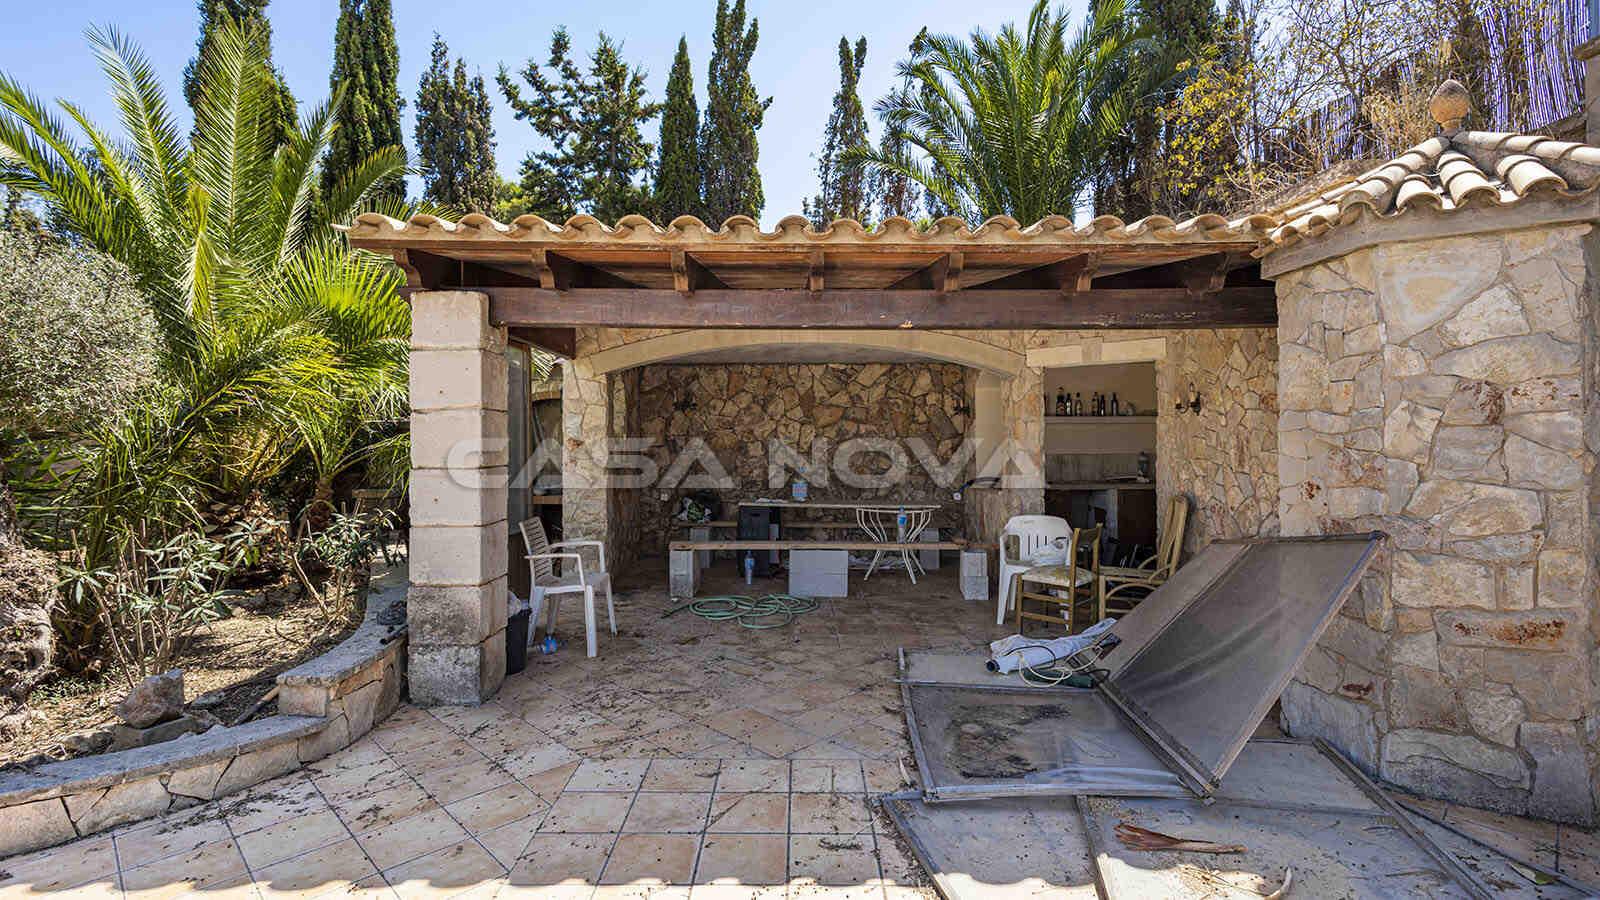 Ref. 2402842 - Umbauprojekt einer Mallorca Villa